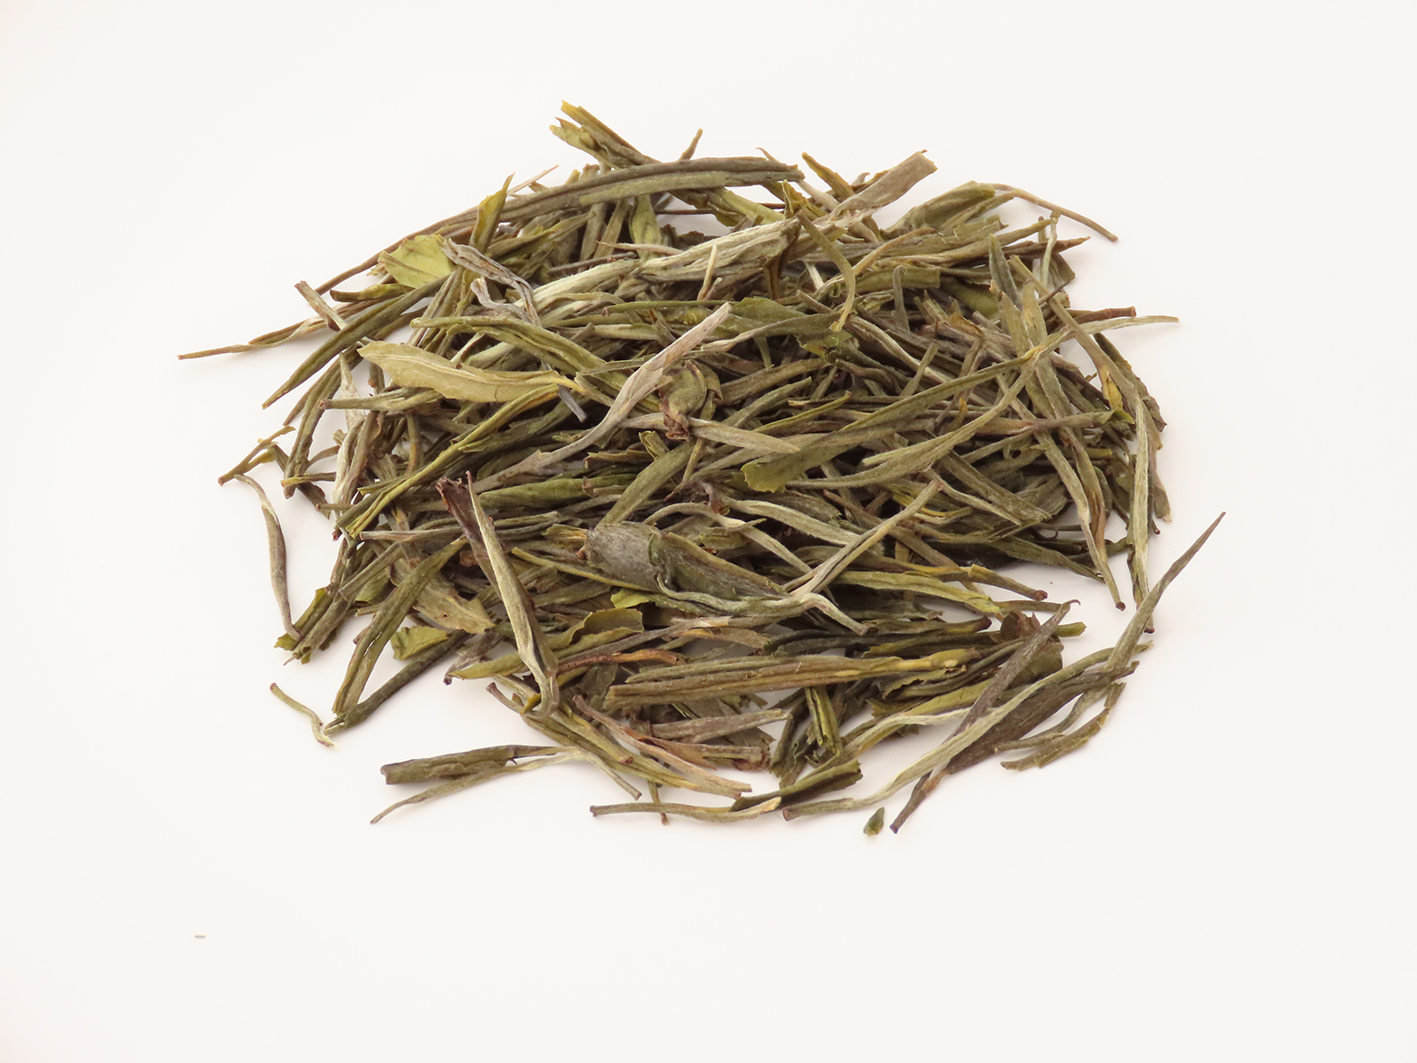 The Nilgiri Tea Company, Slender Green Tea.